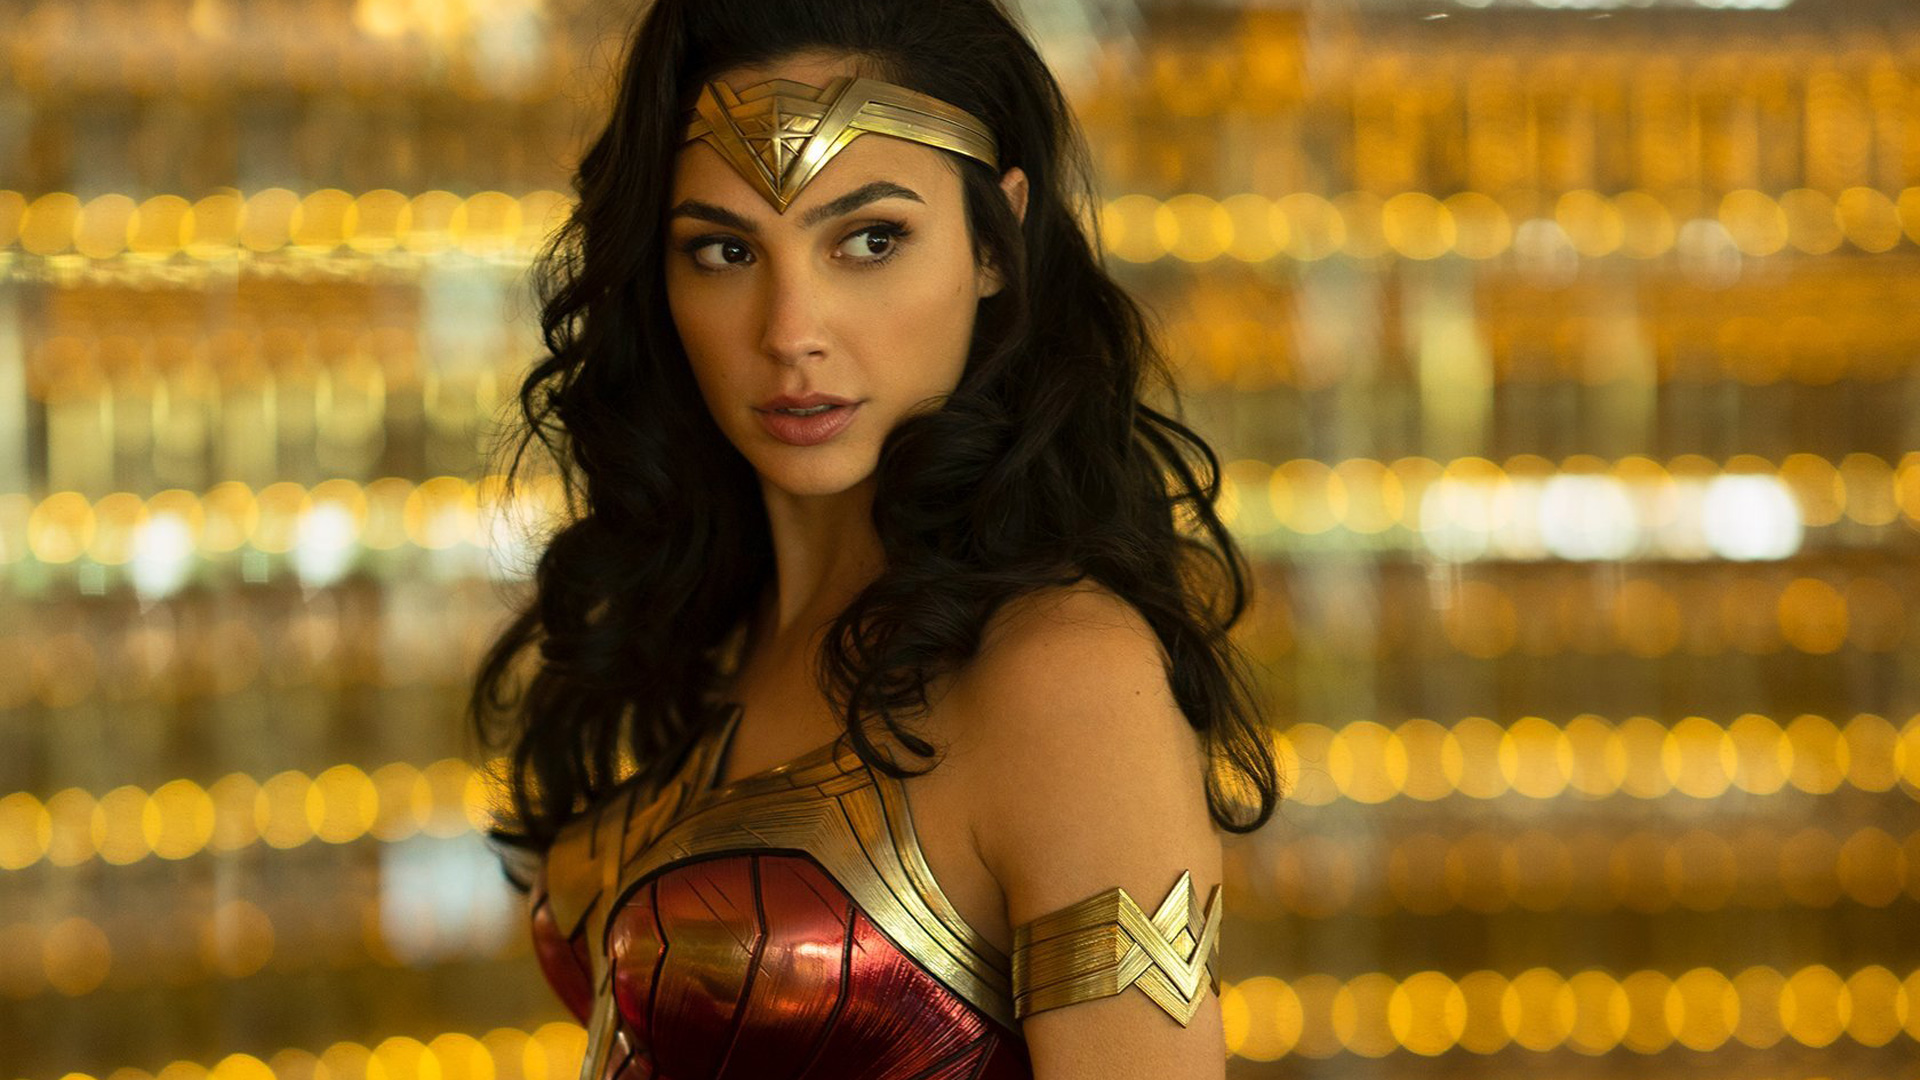 Gal Gadot Wonder Woman 1984 Movie Hd Movies 4k Wallpapers Images